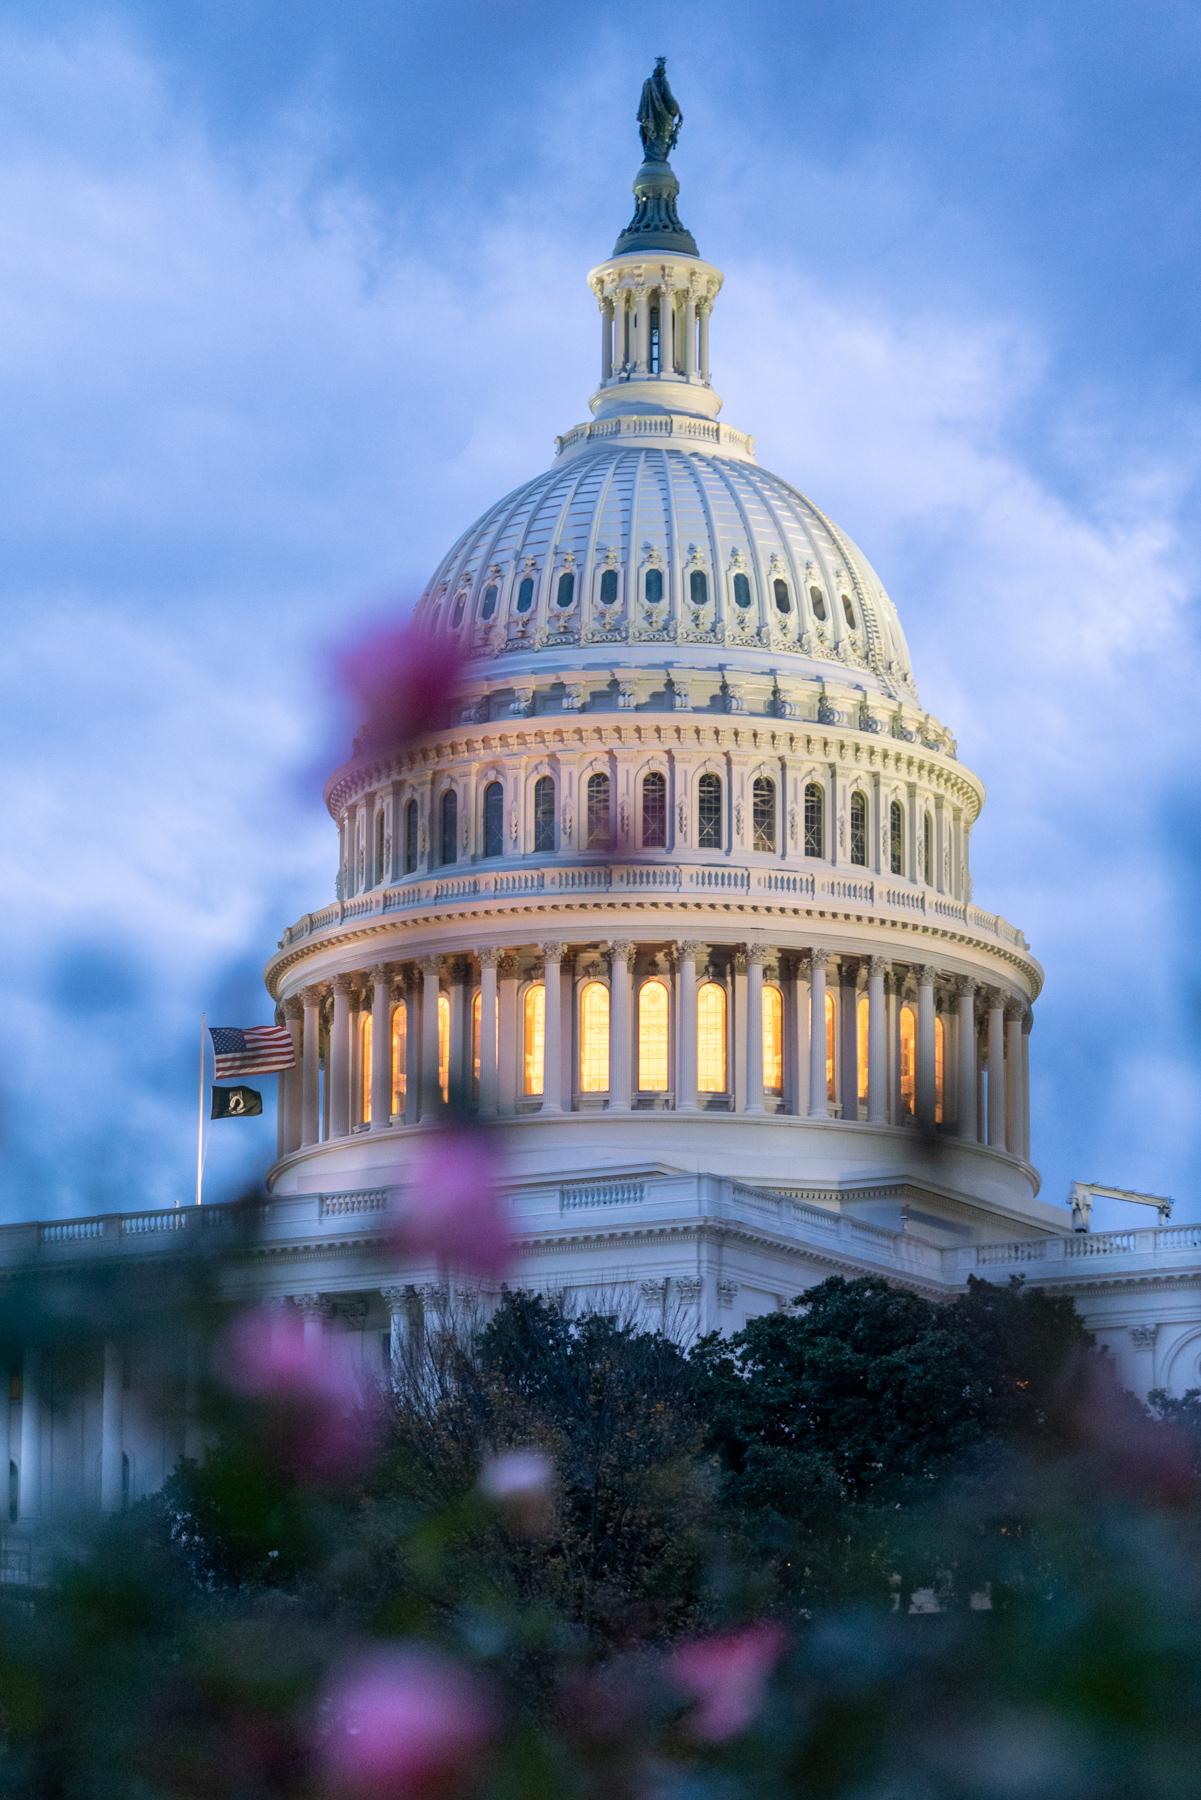 us capitol, roses, us capitol grounds, us capitol building, sunrise, blue hour